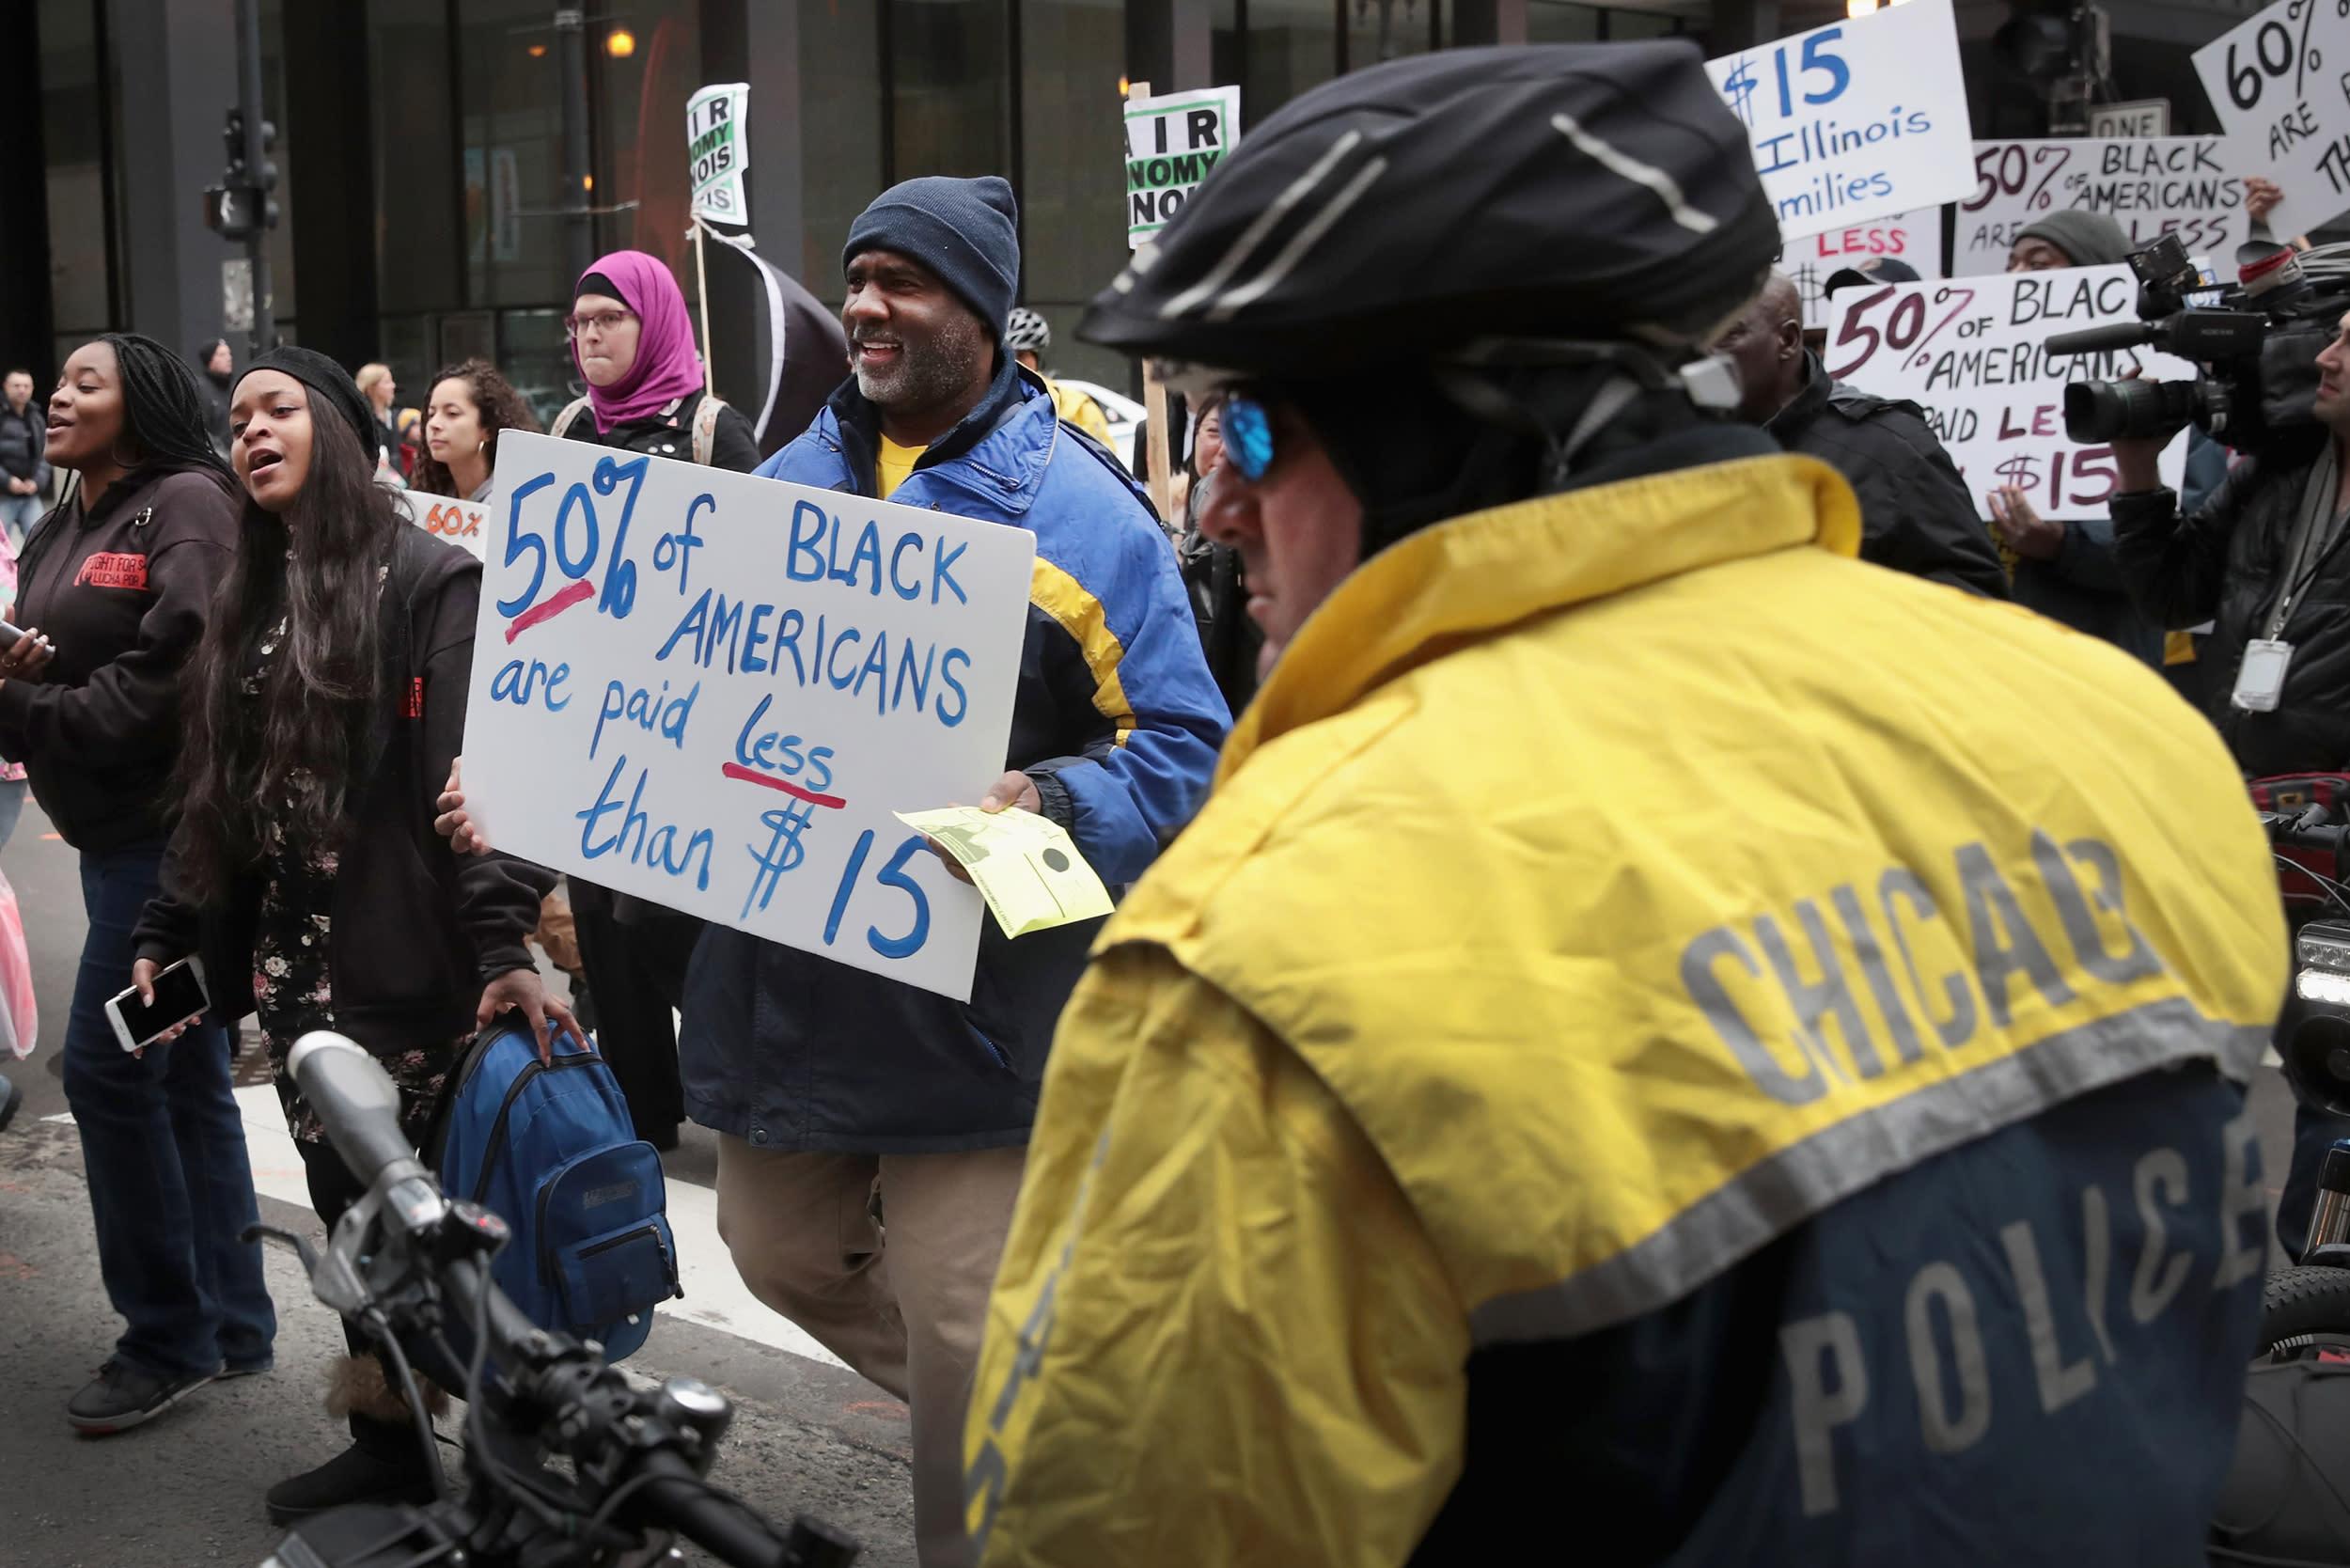 This critical link could help bridge America's racial wealth gap